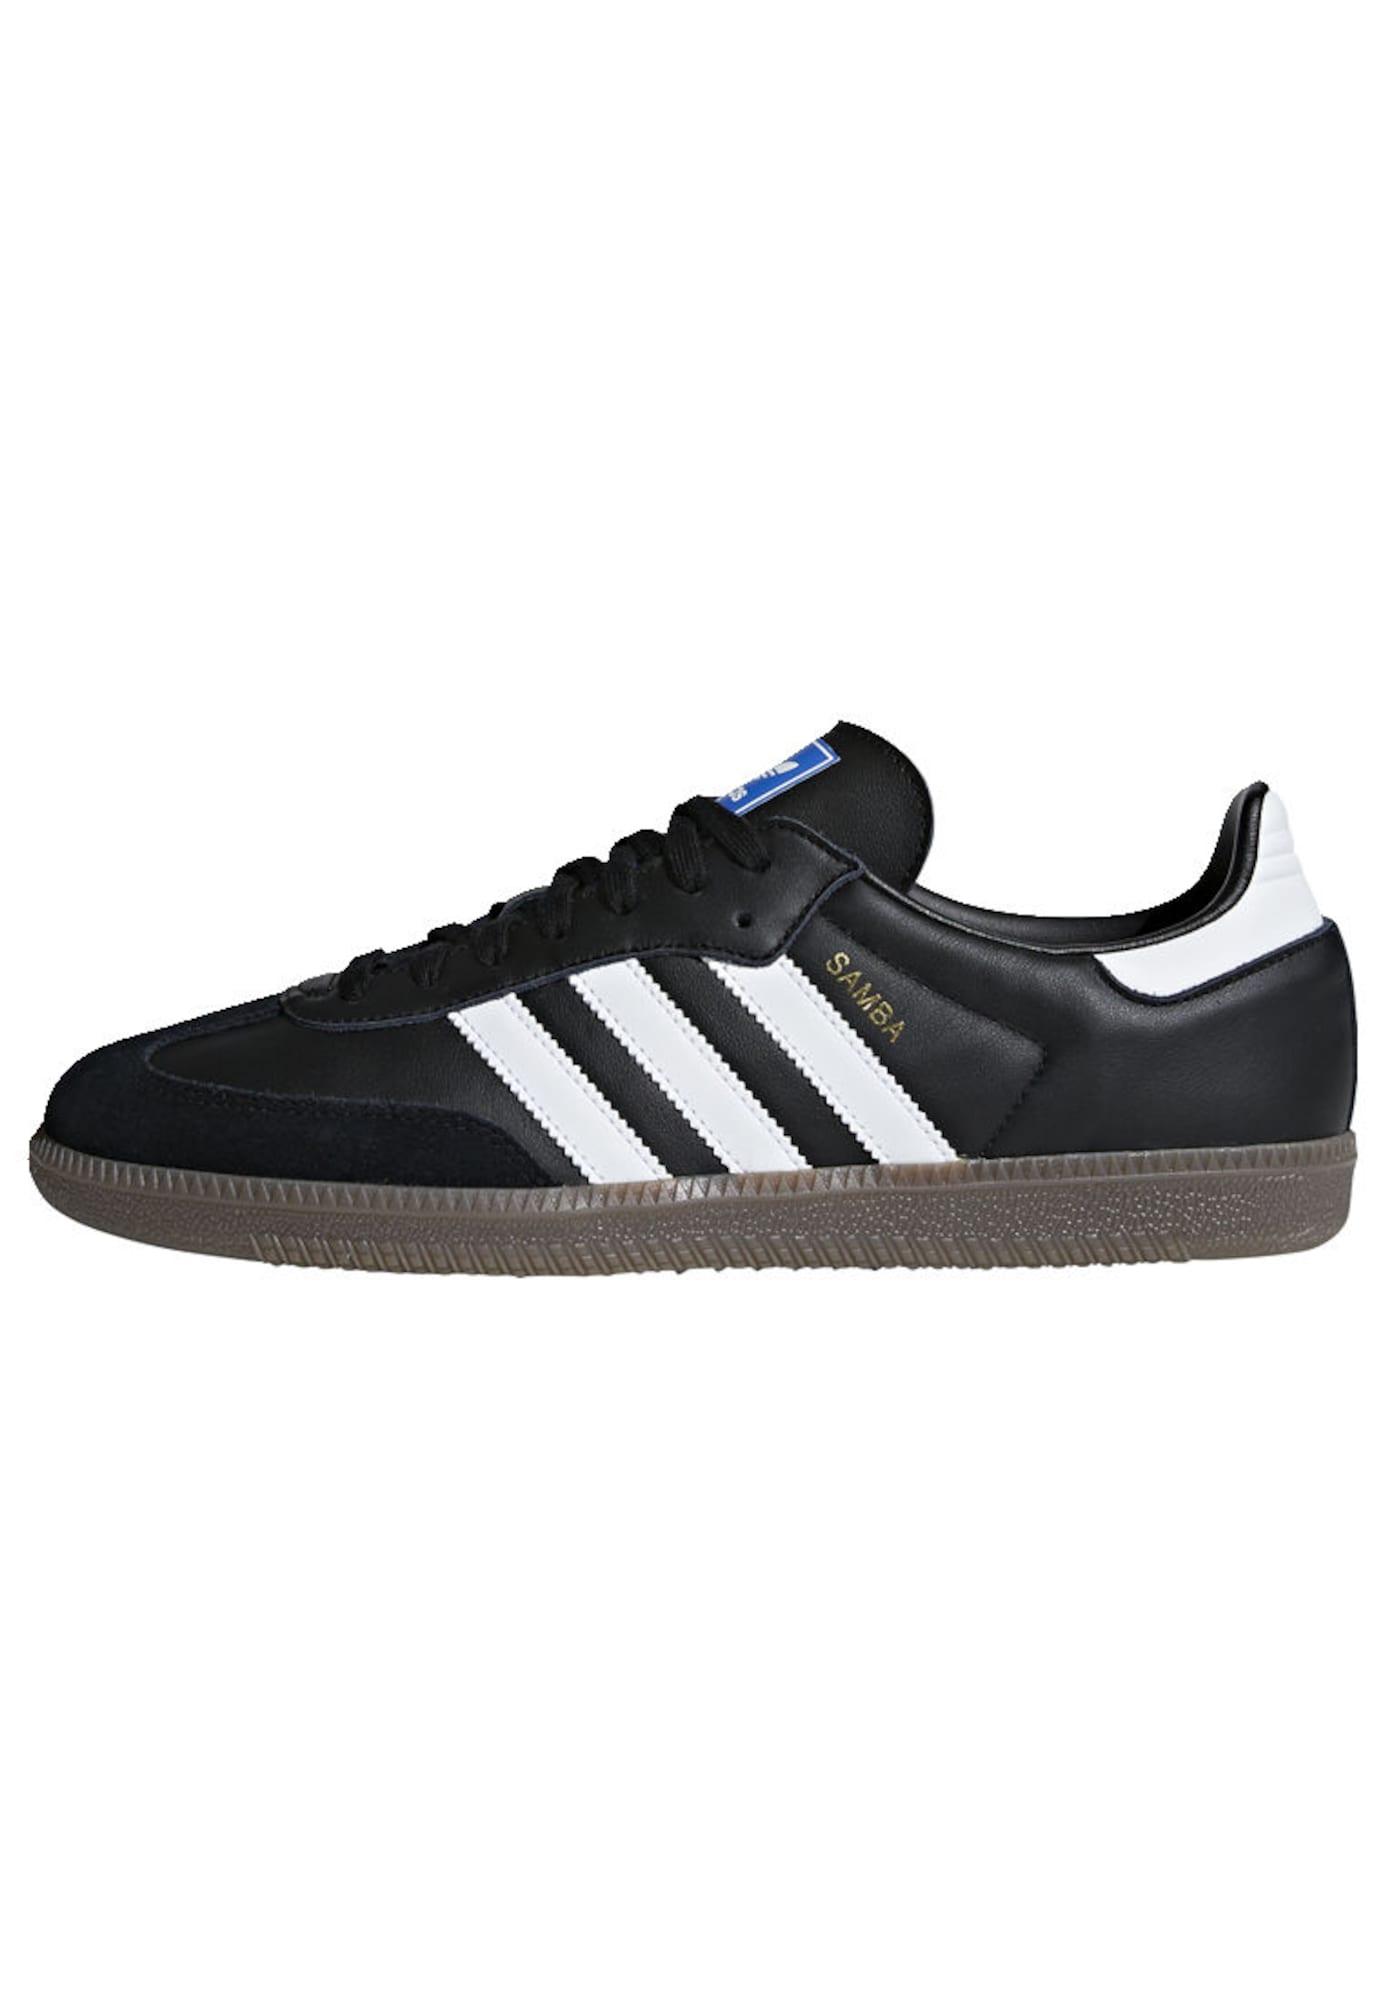 ADIDAS ORIGINALS, Dames Sneakers laag 'Samba Og', zwart / wit